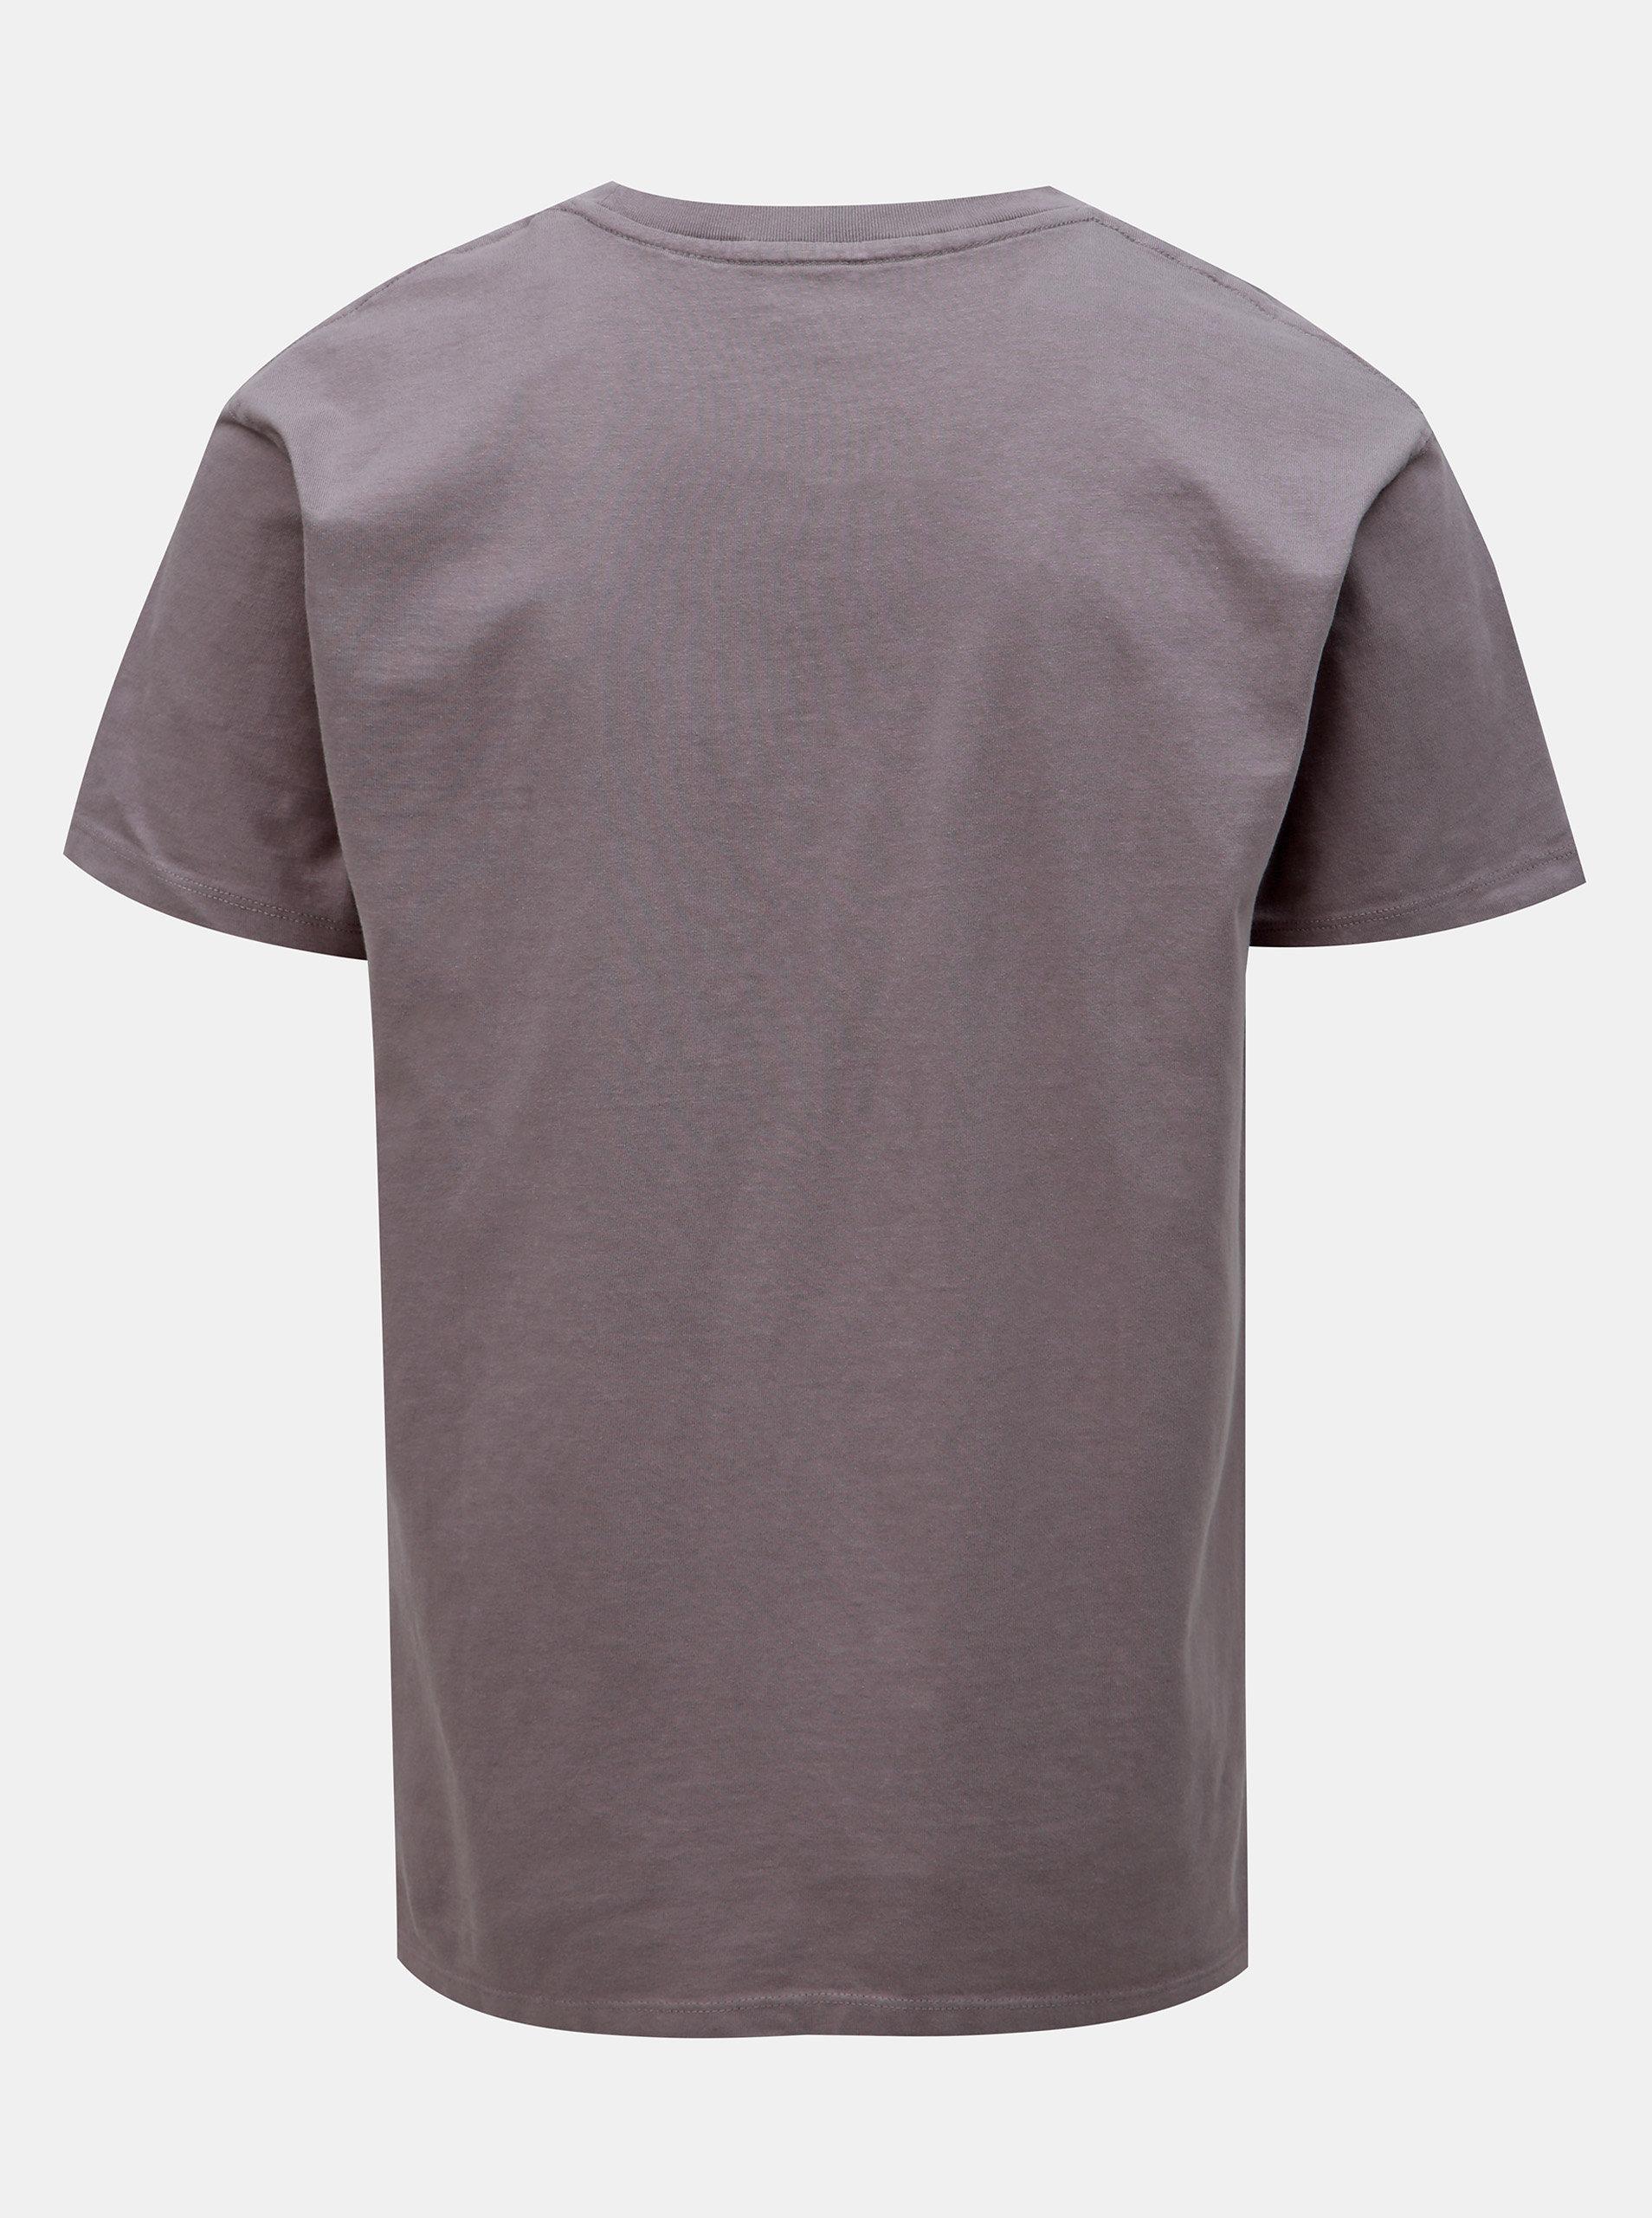 ac828d5c3 Fialové tričko s potlačou Jack & Jones Luke ...